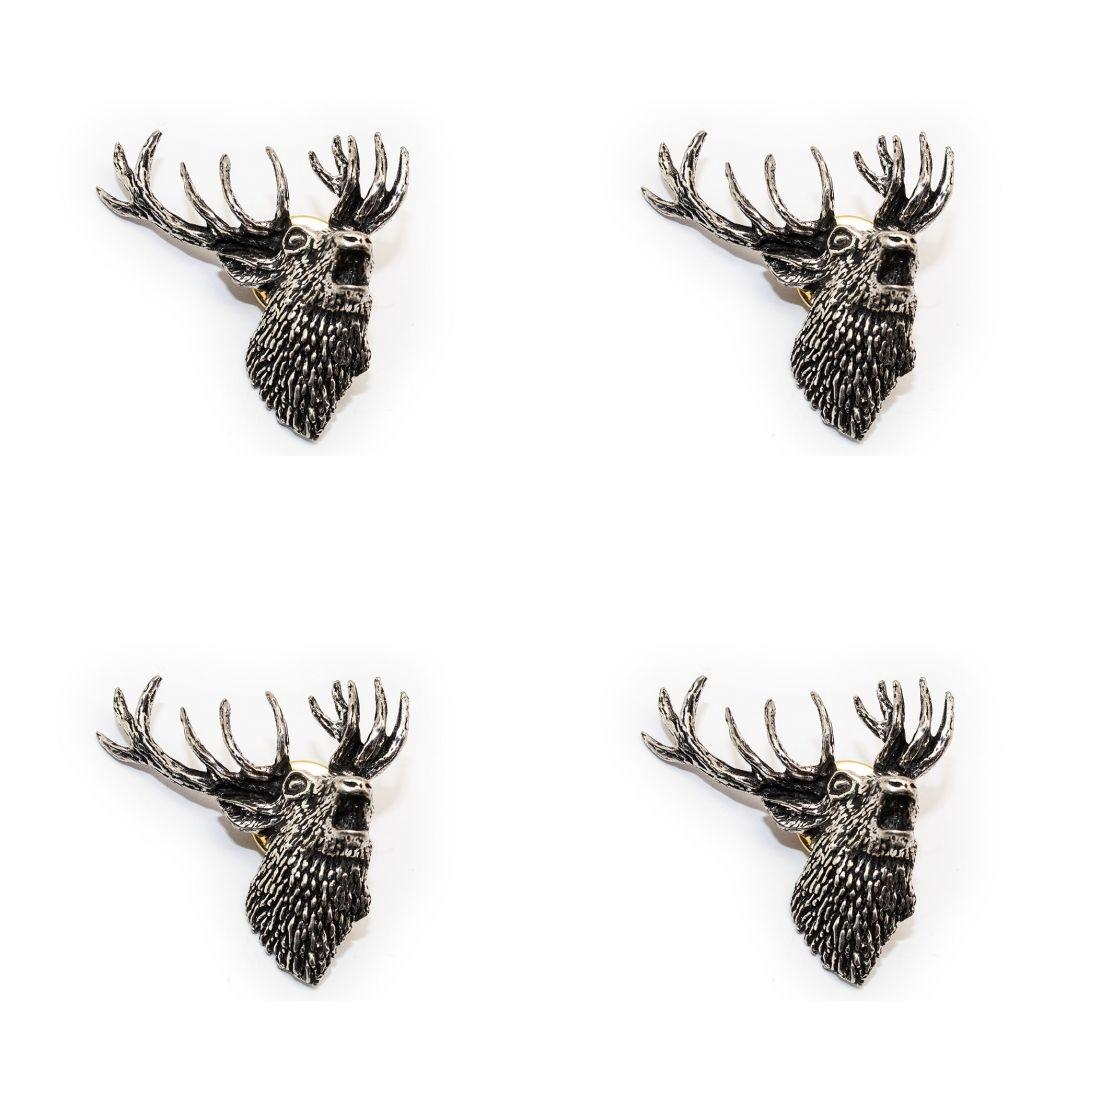 4x Pin Anstecker Badge röhrender Hirsch , 3,6x4cm